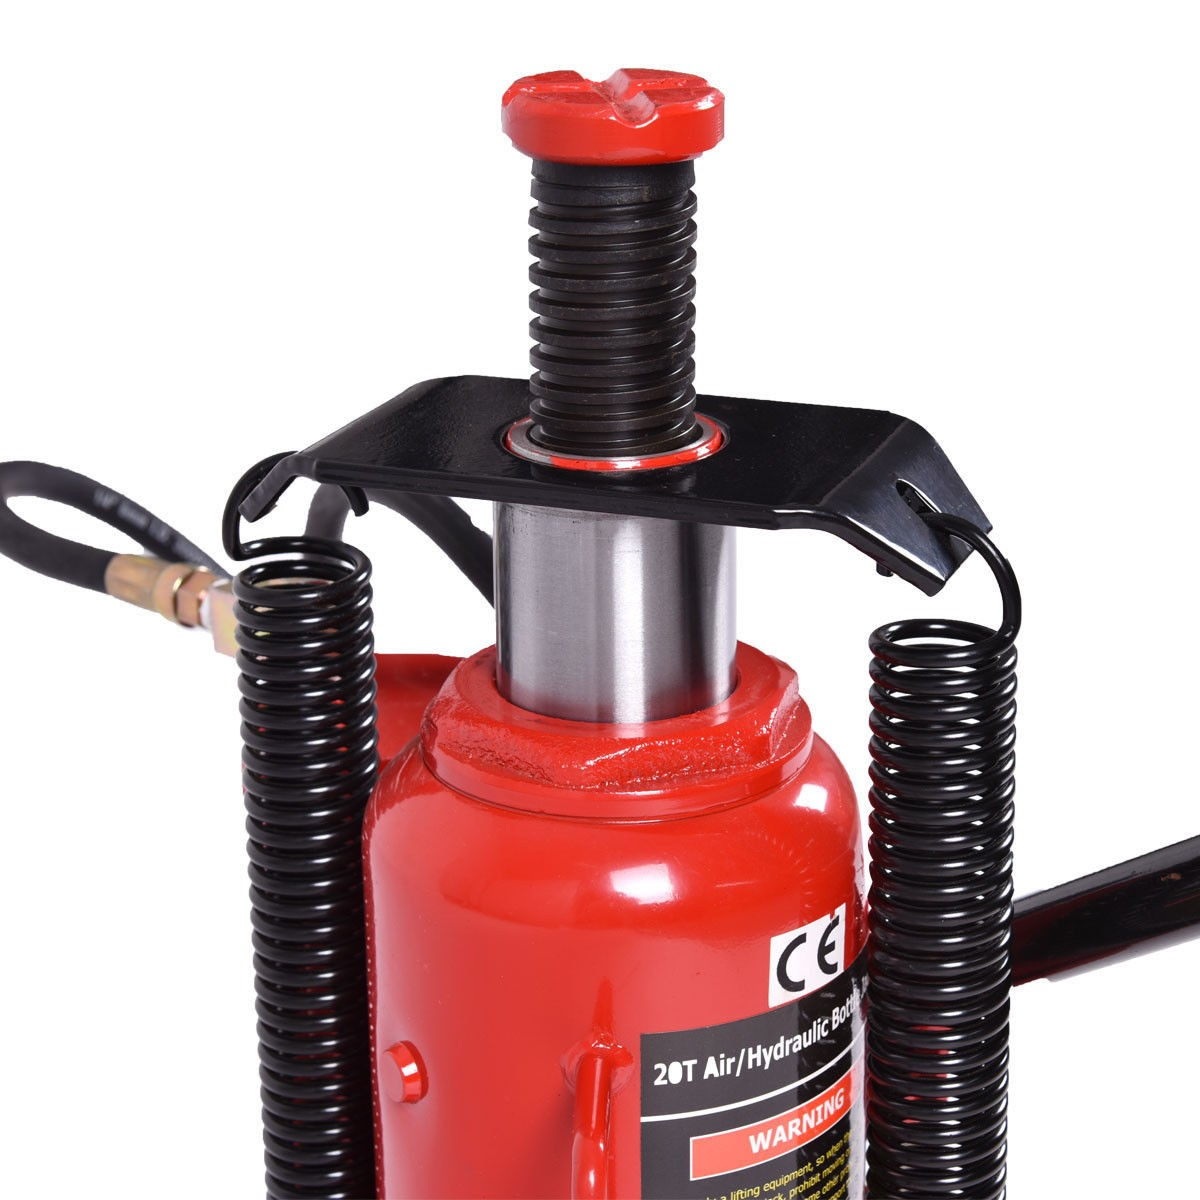 Automotive Lifts And Jacks : T ton air hydraulic bottle jack lb heavy duty auto